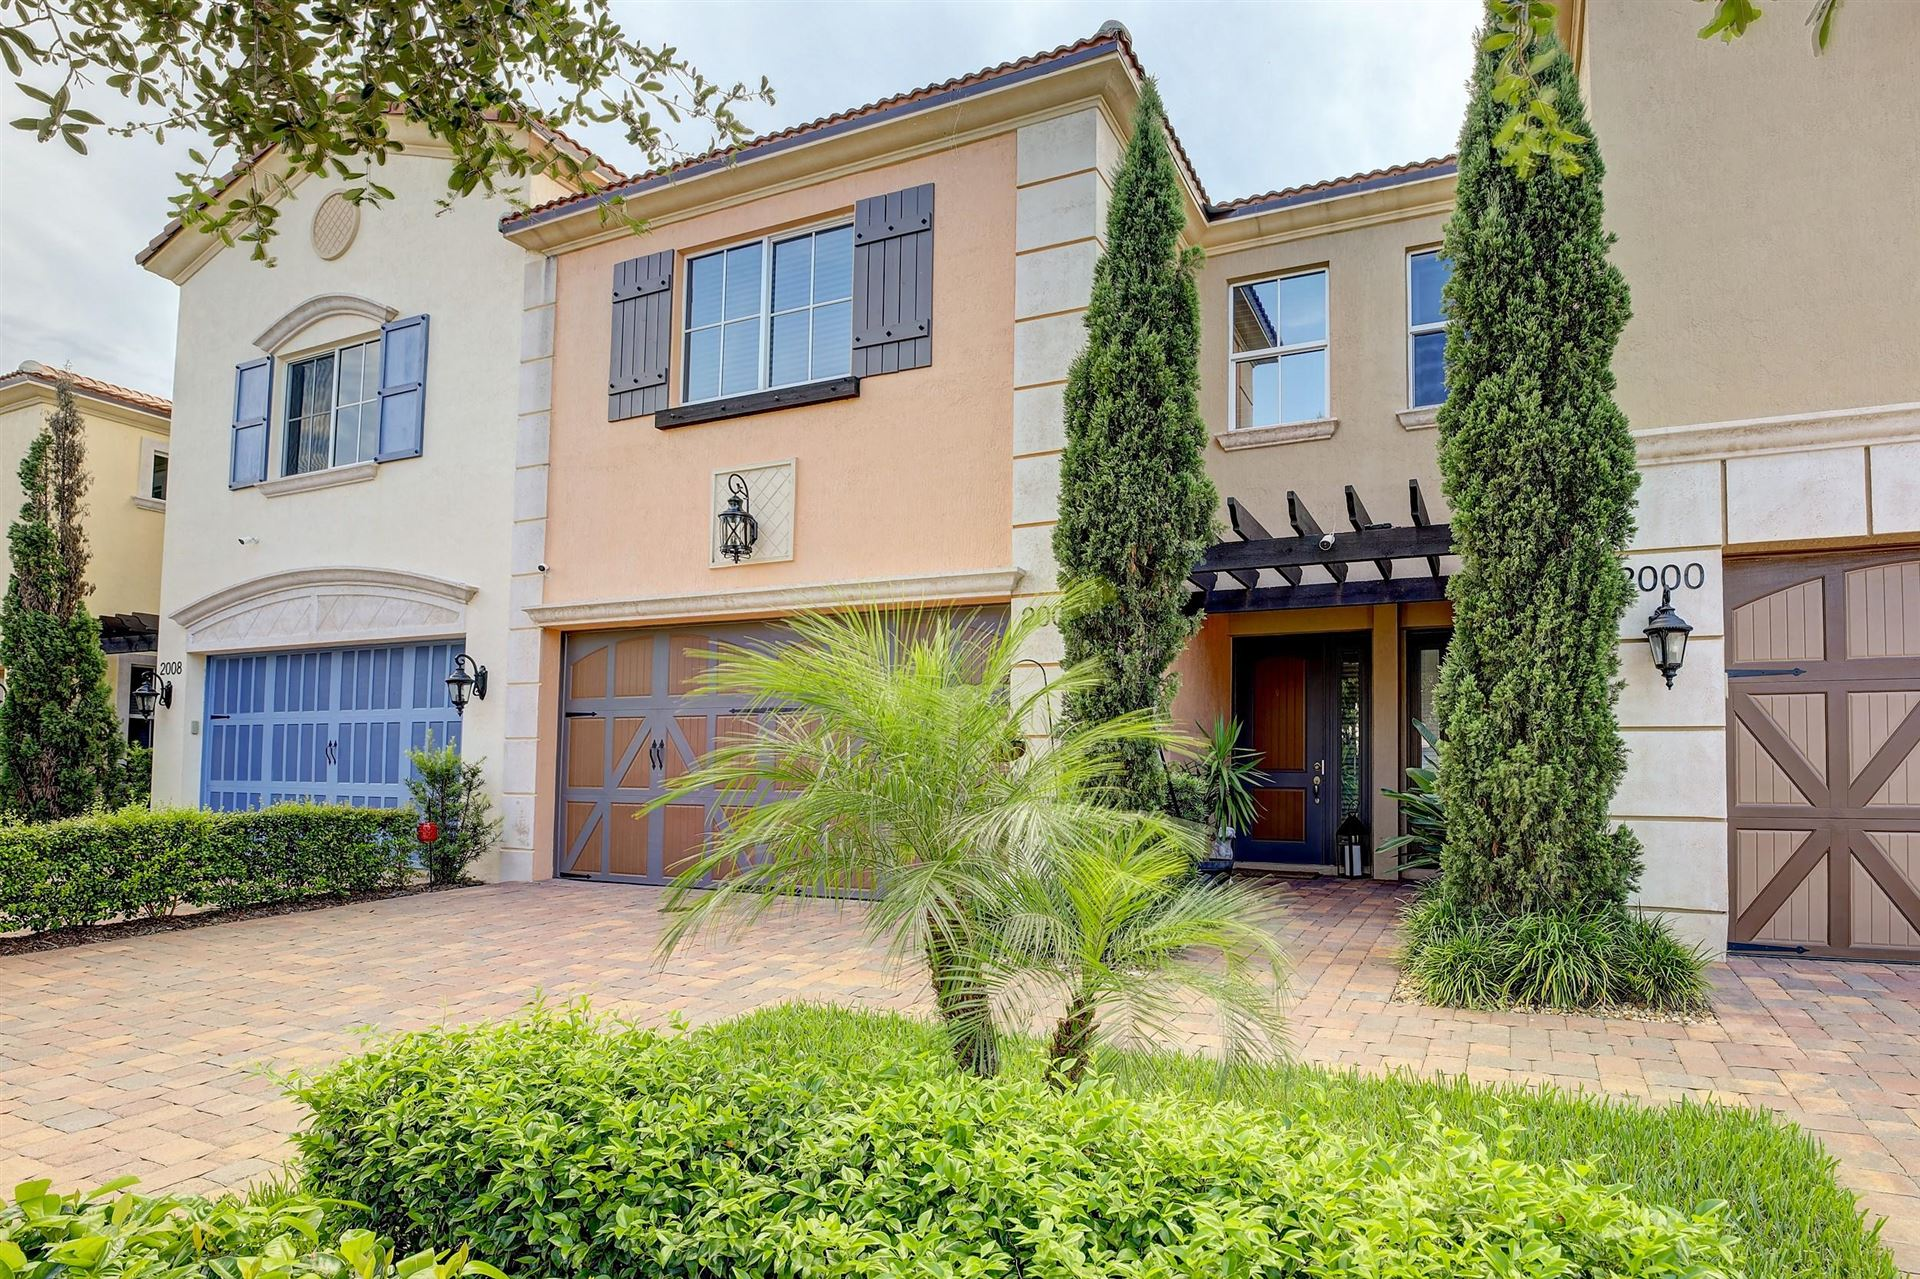 2004 Foxtail View Court, West Palm Beach, FL 33411 - #: RX-10638840